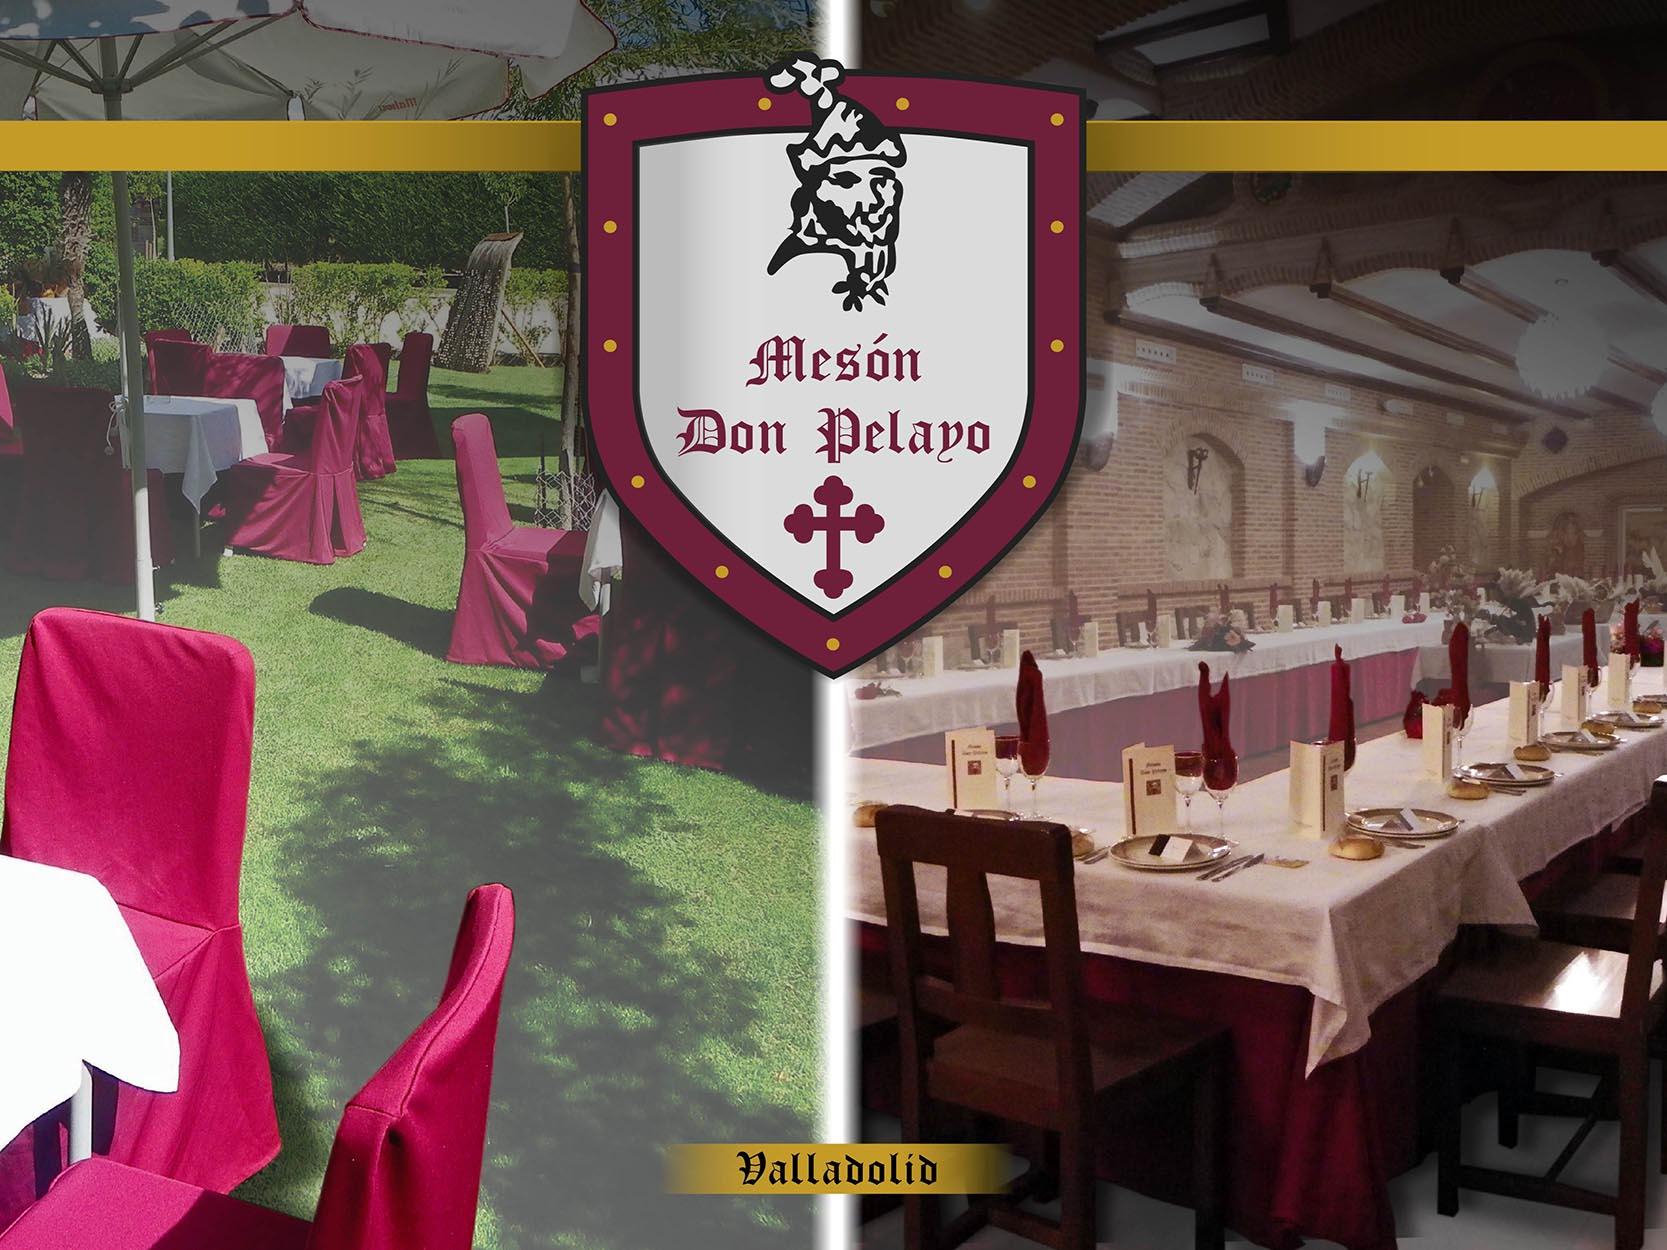 Catálogo bodas y celebraciones Mesón Don Pelayo 2019 intro